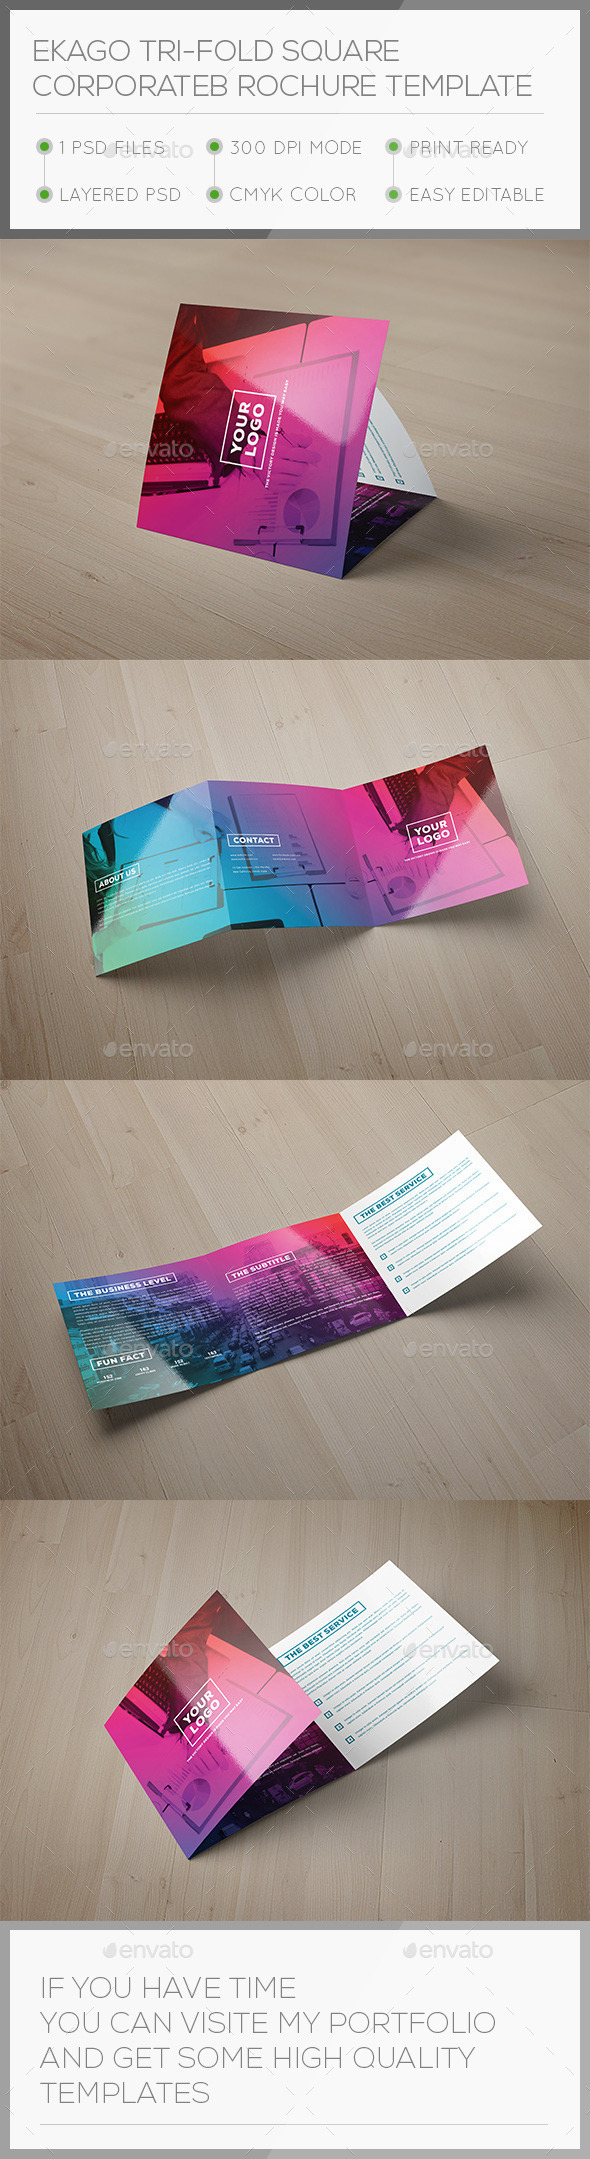 Ekago Tri-fold Square Brochure Template - Brochures Print Templates